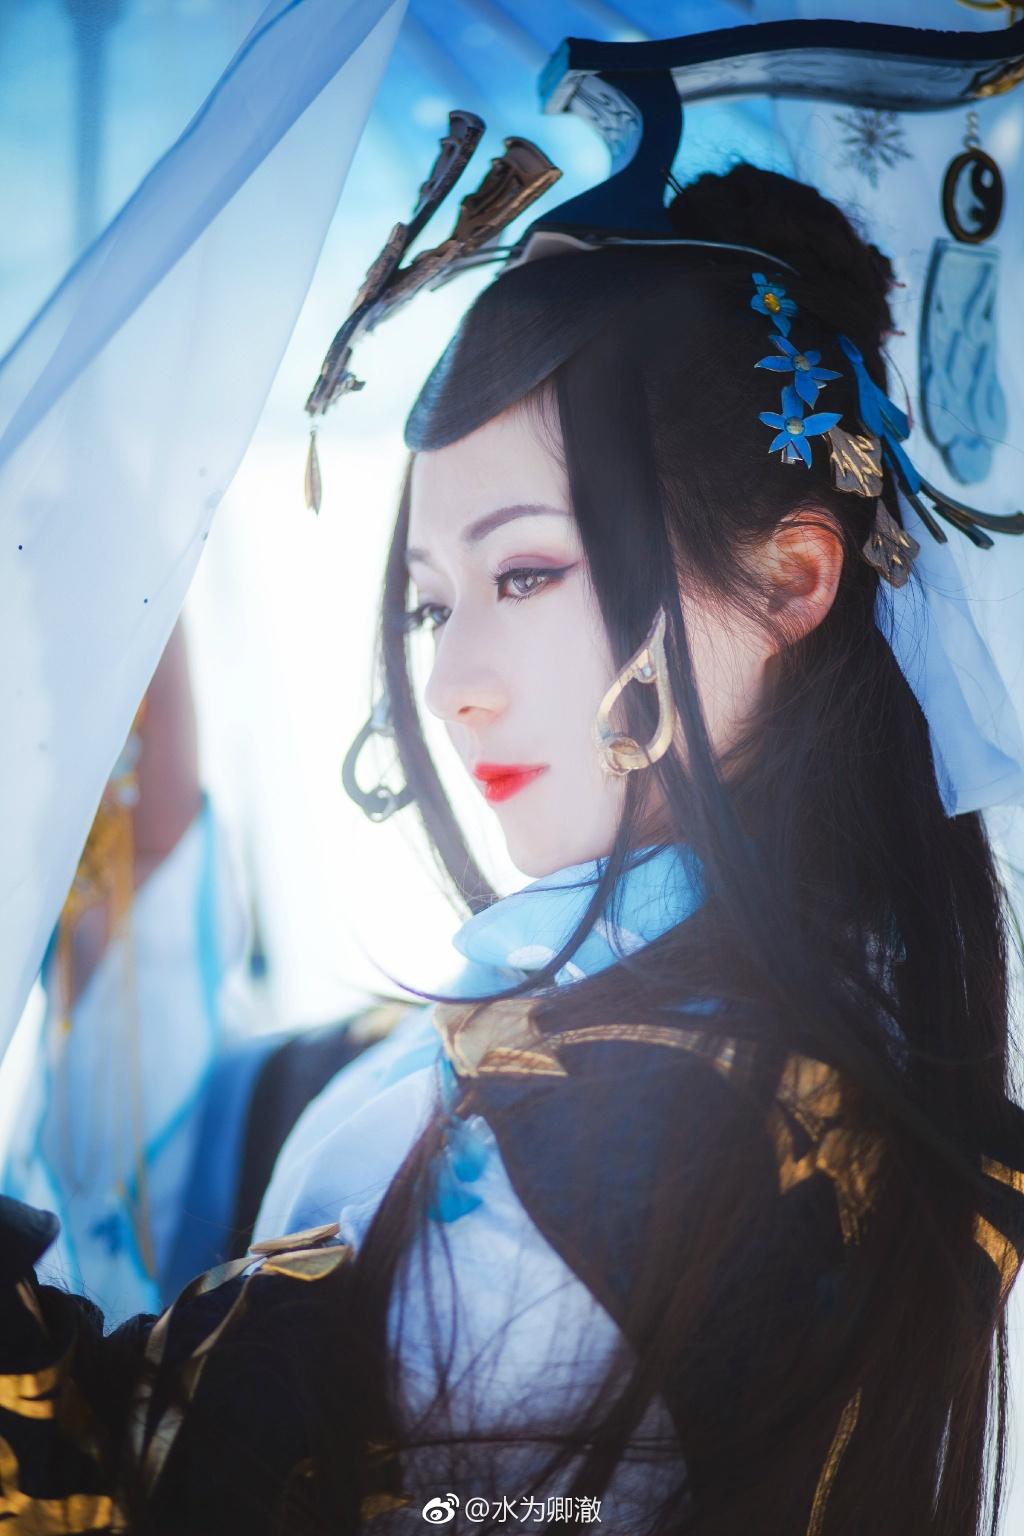 【cos正片】剑网三·纯阳·破虏道姑 cn:水为卿澈 cosplay-第1张